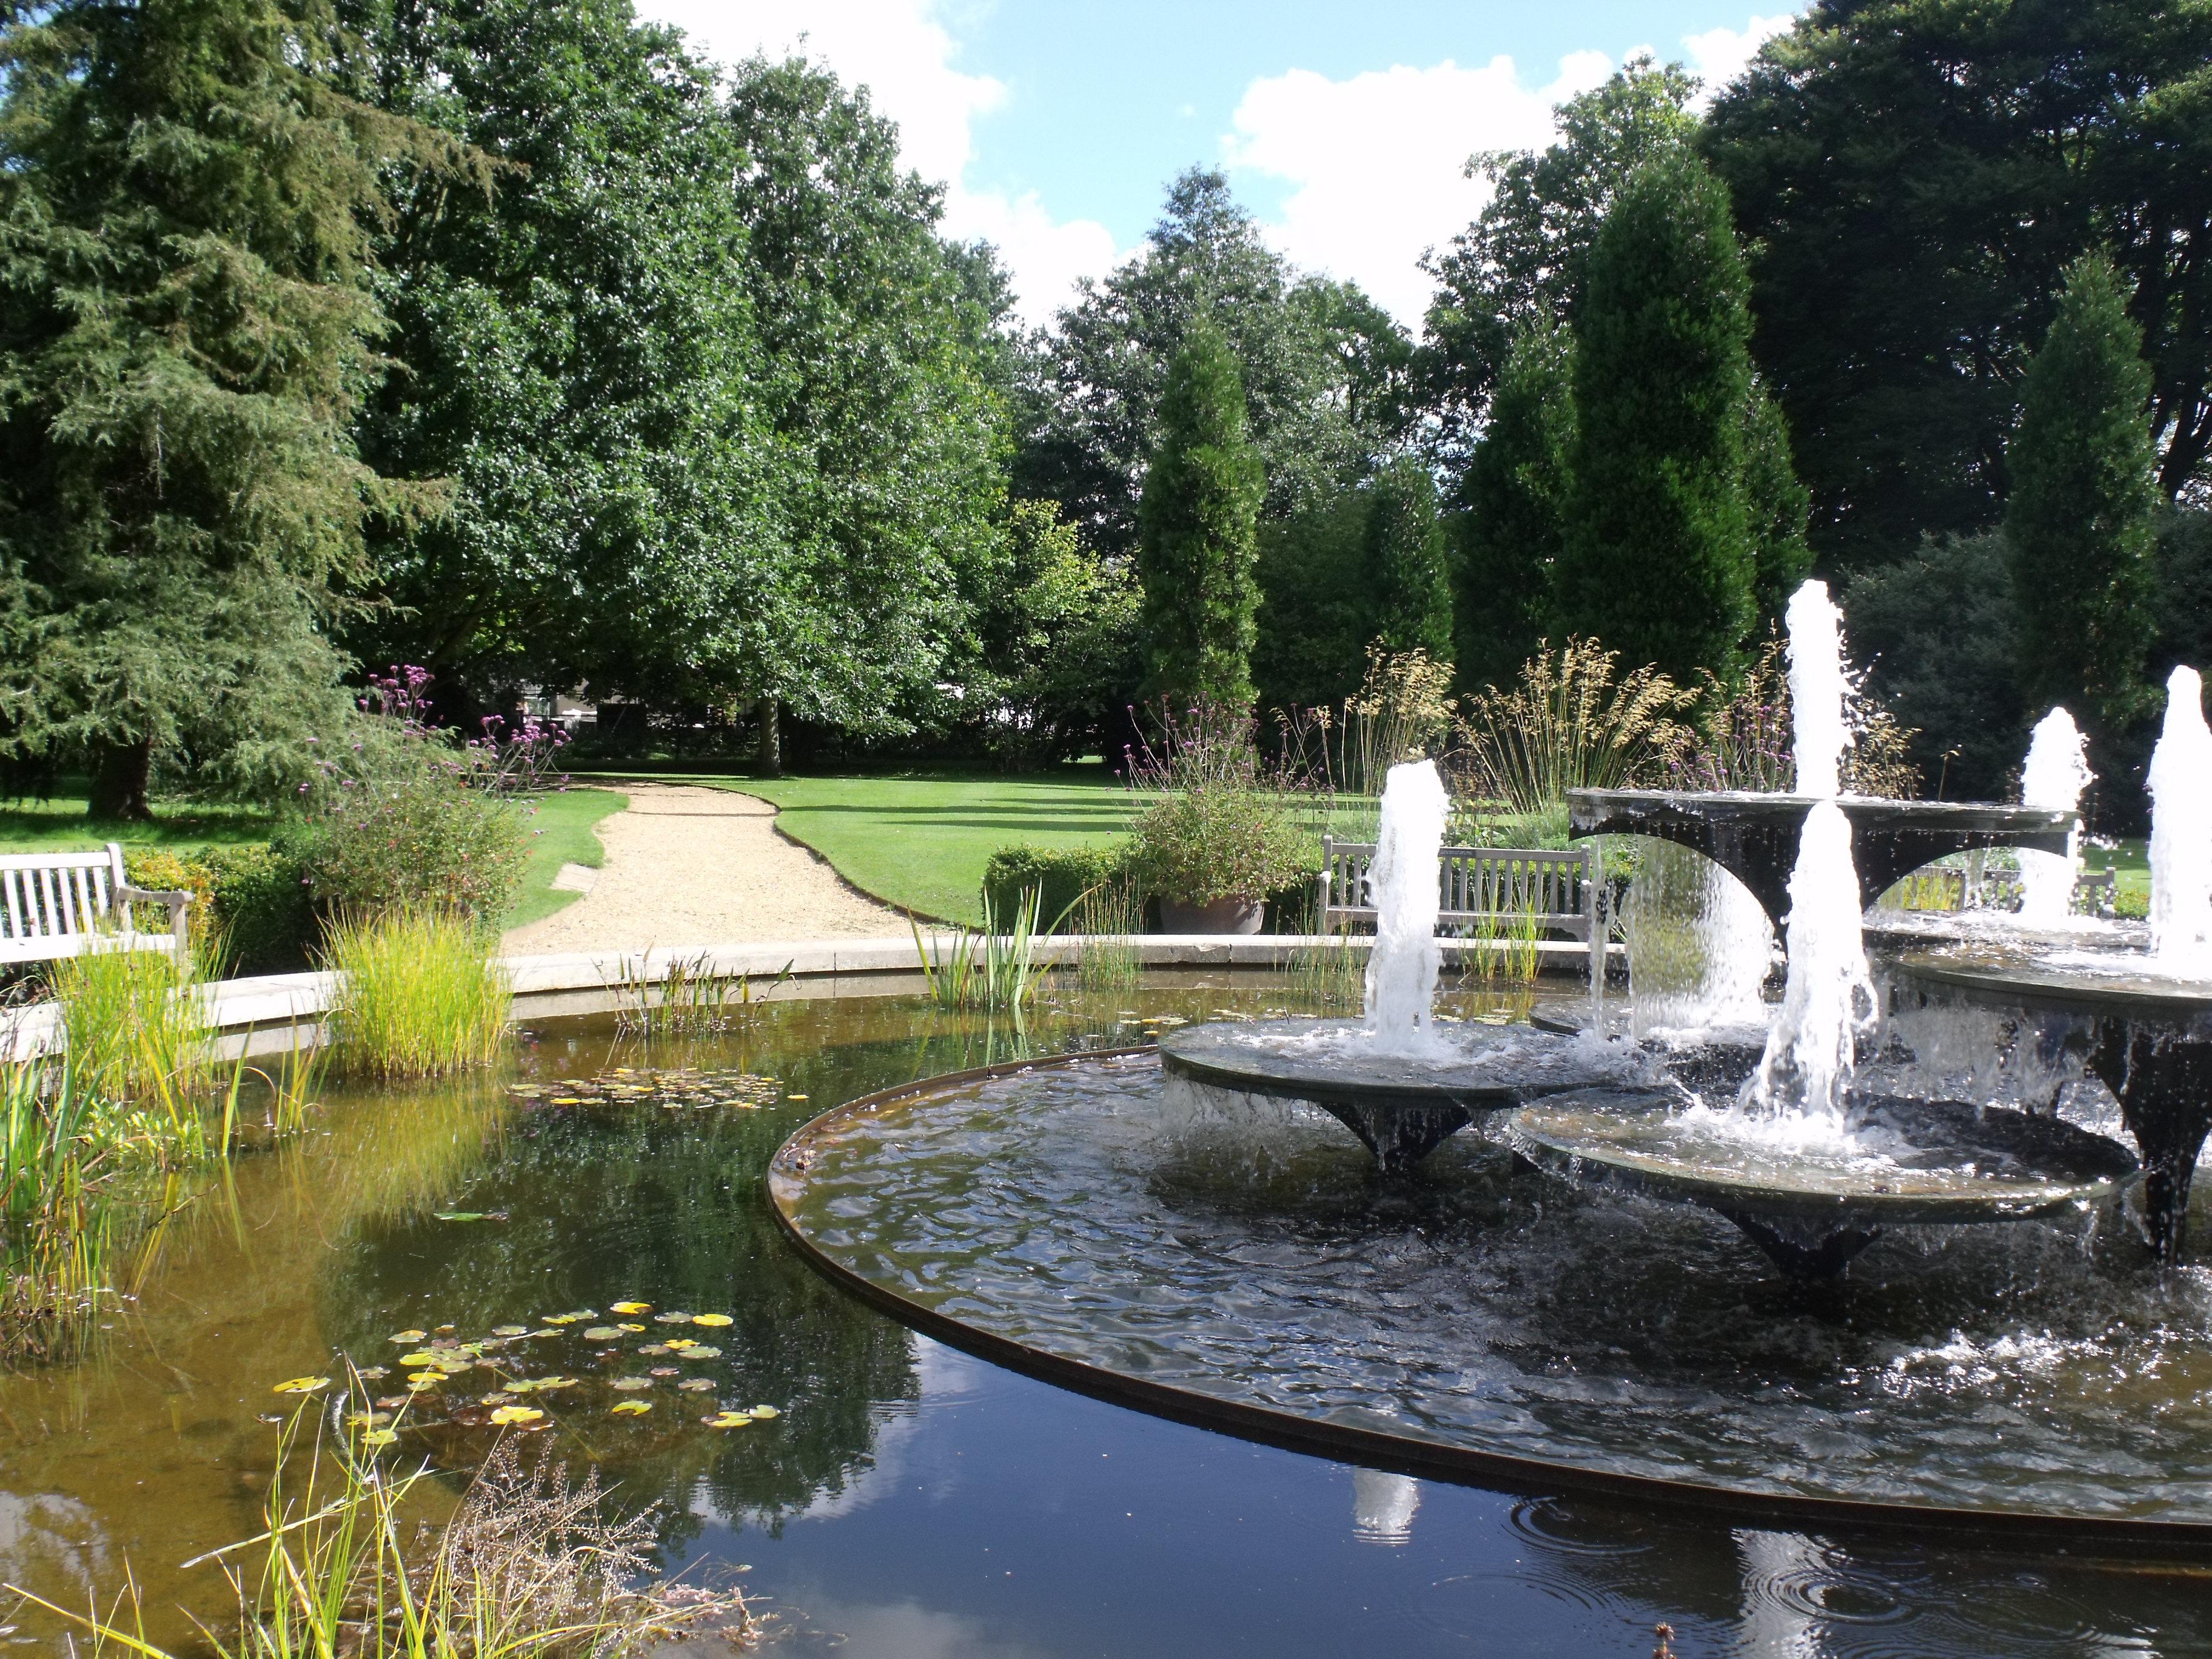 Cambridge Botanical Gardens >> University of Cambridge Botanical Gardens!!! - EC Cambridge Blog